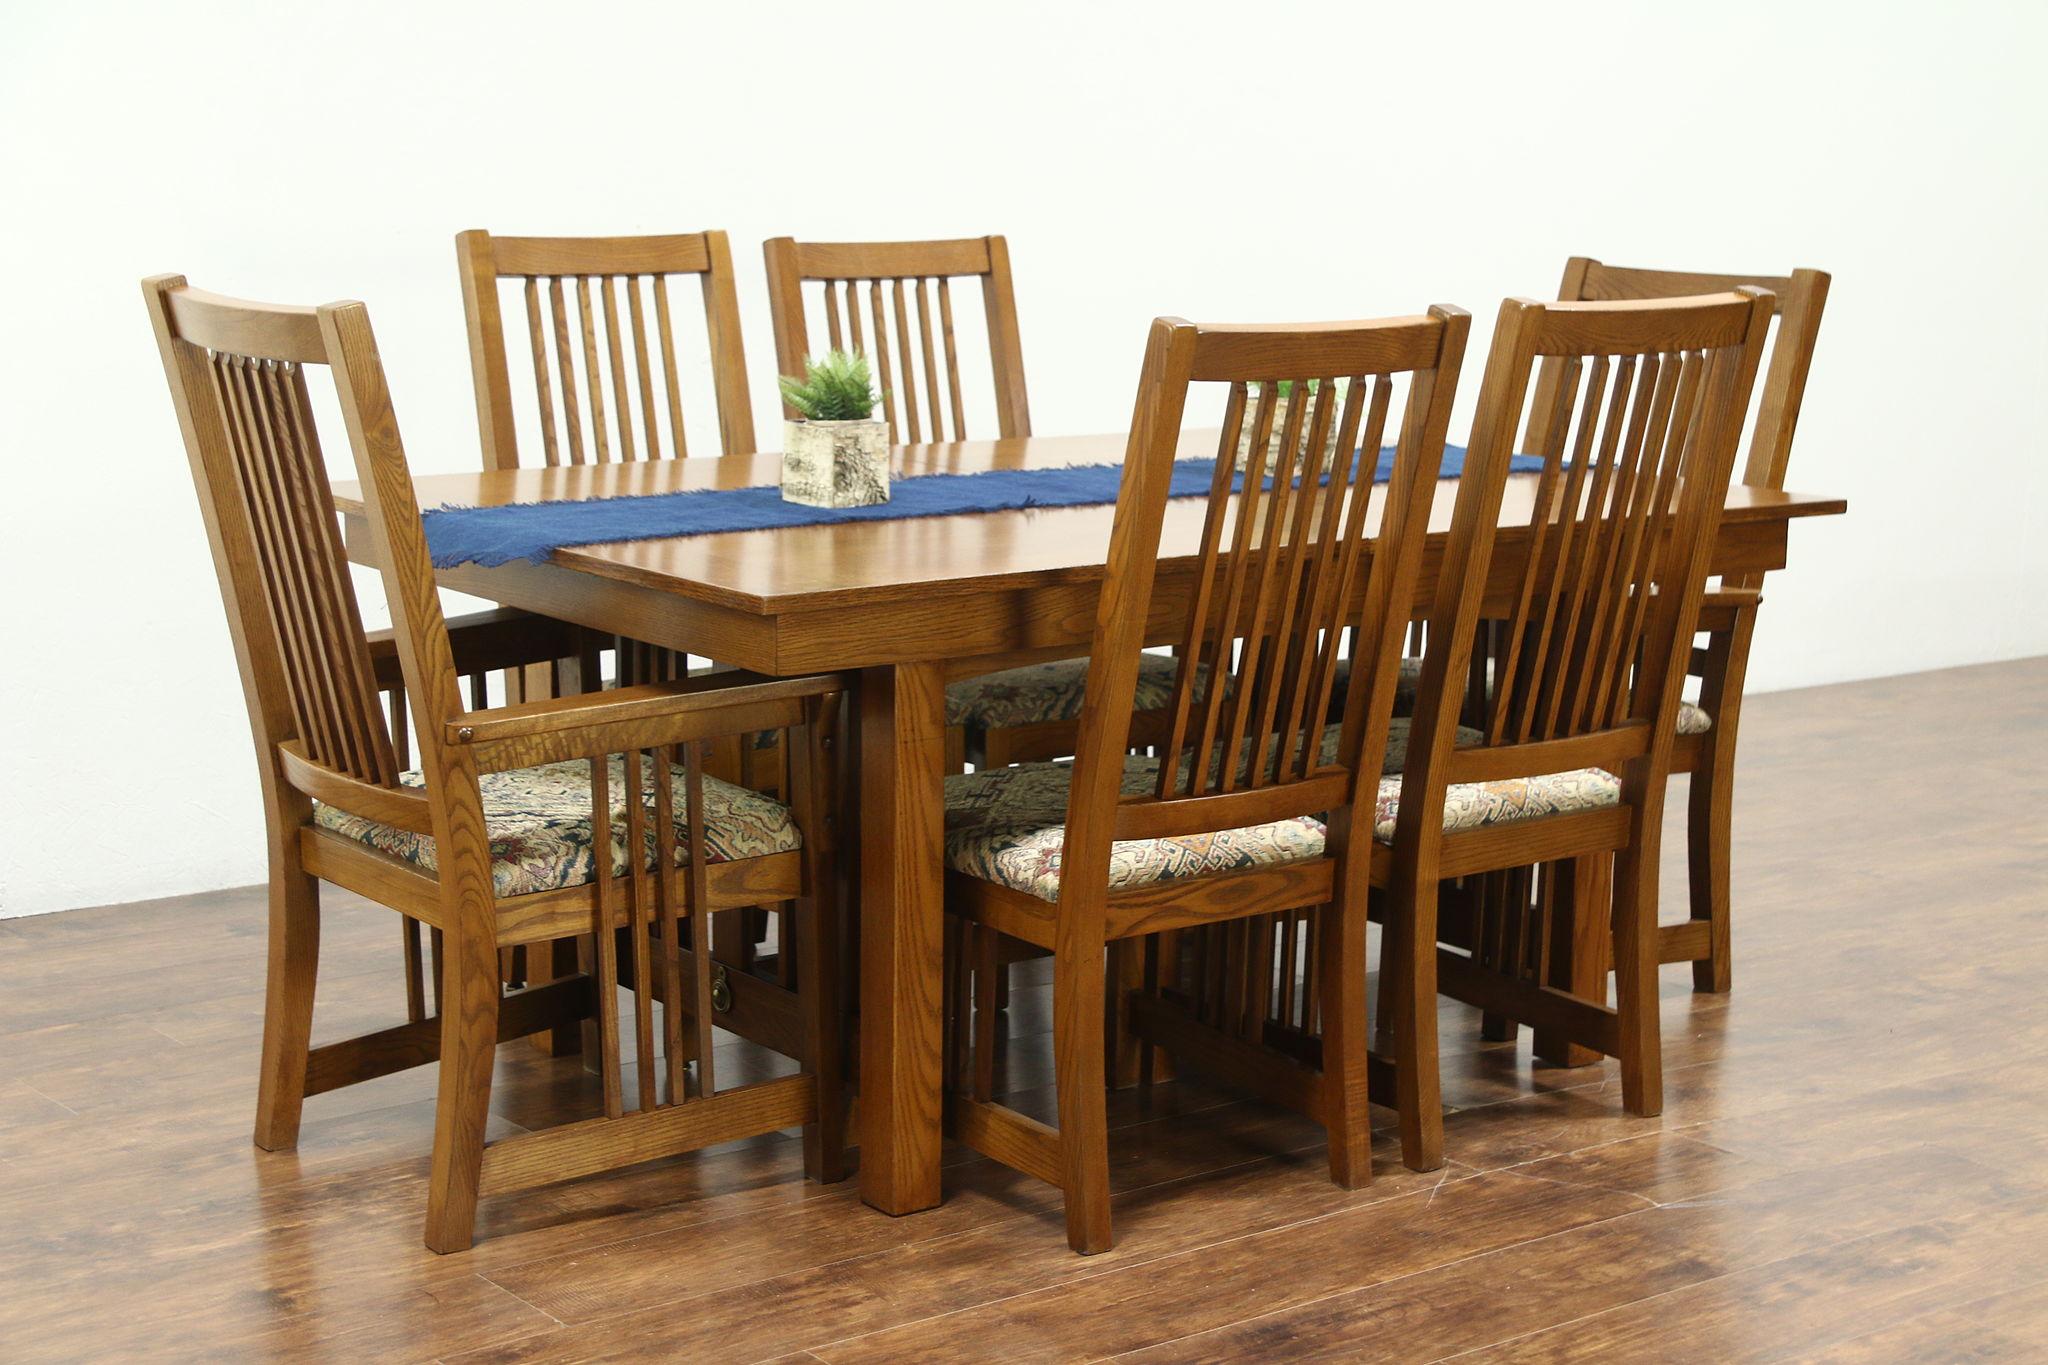 Sold Prairie Or Craftsman Vintage Oak Dining Set Table 2 Leaves 6 Chairs Harp Gallery